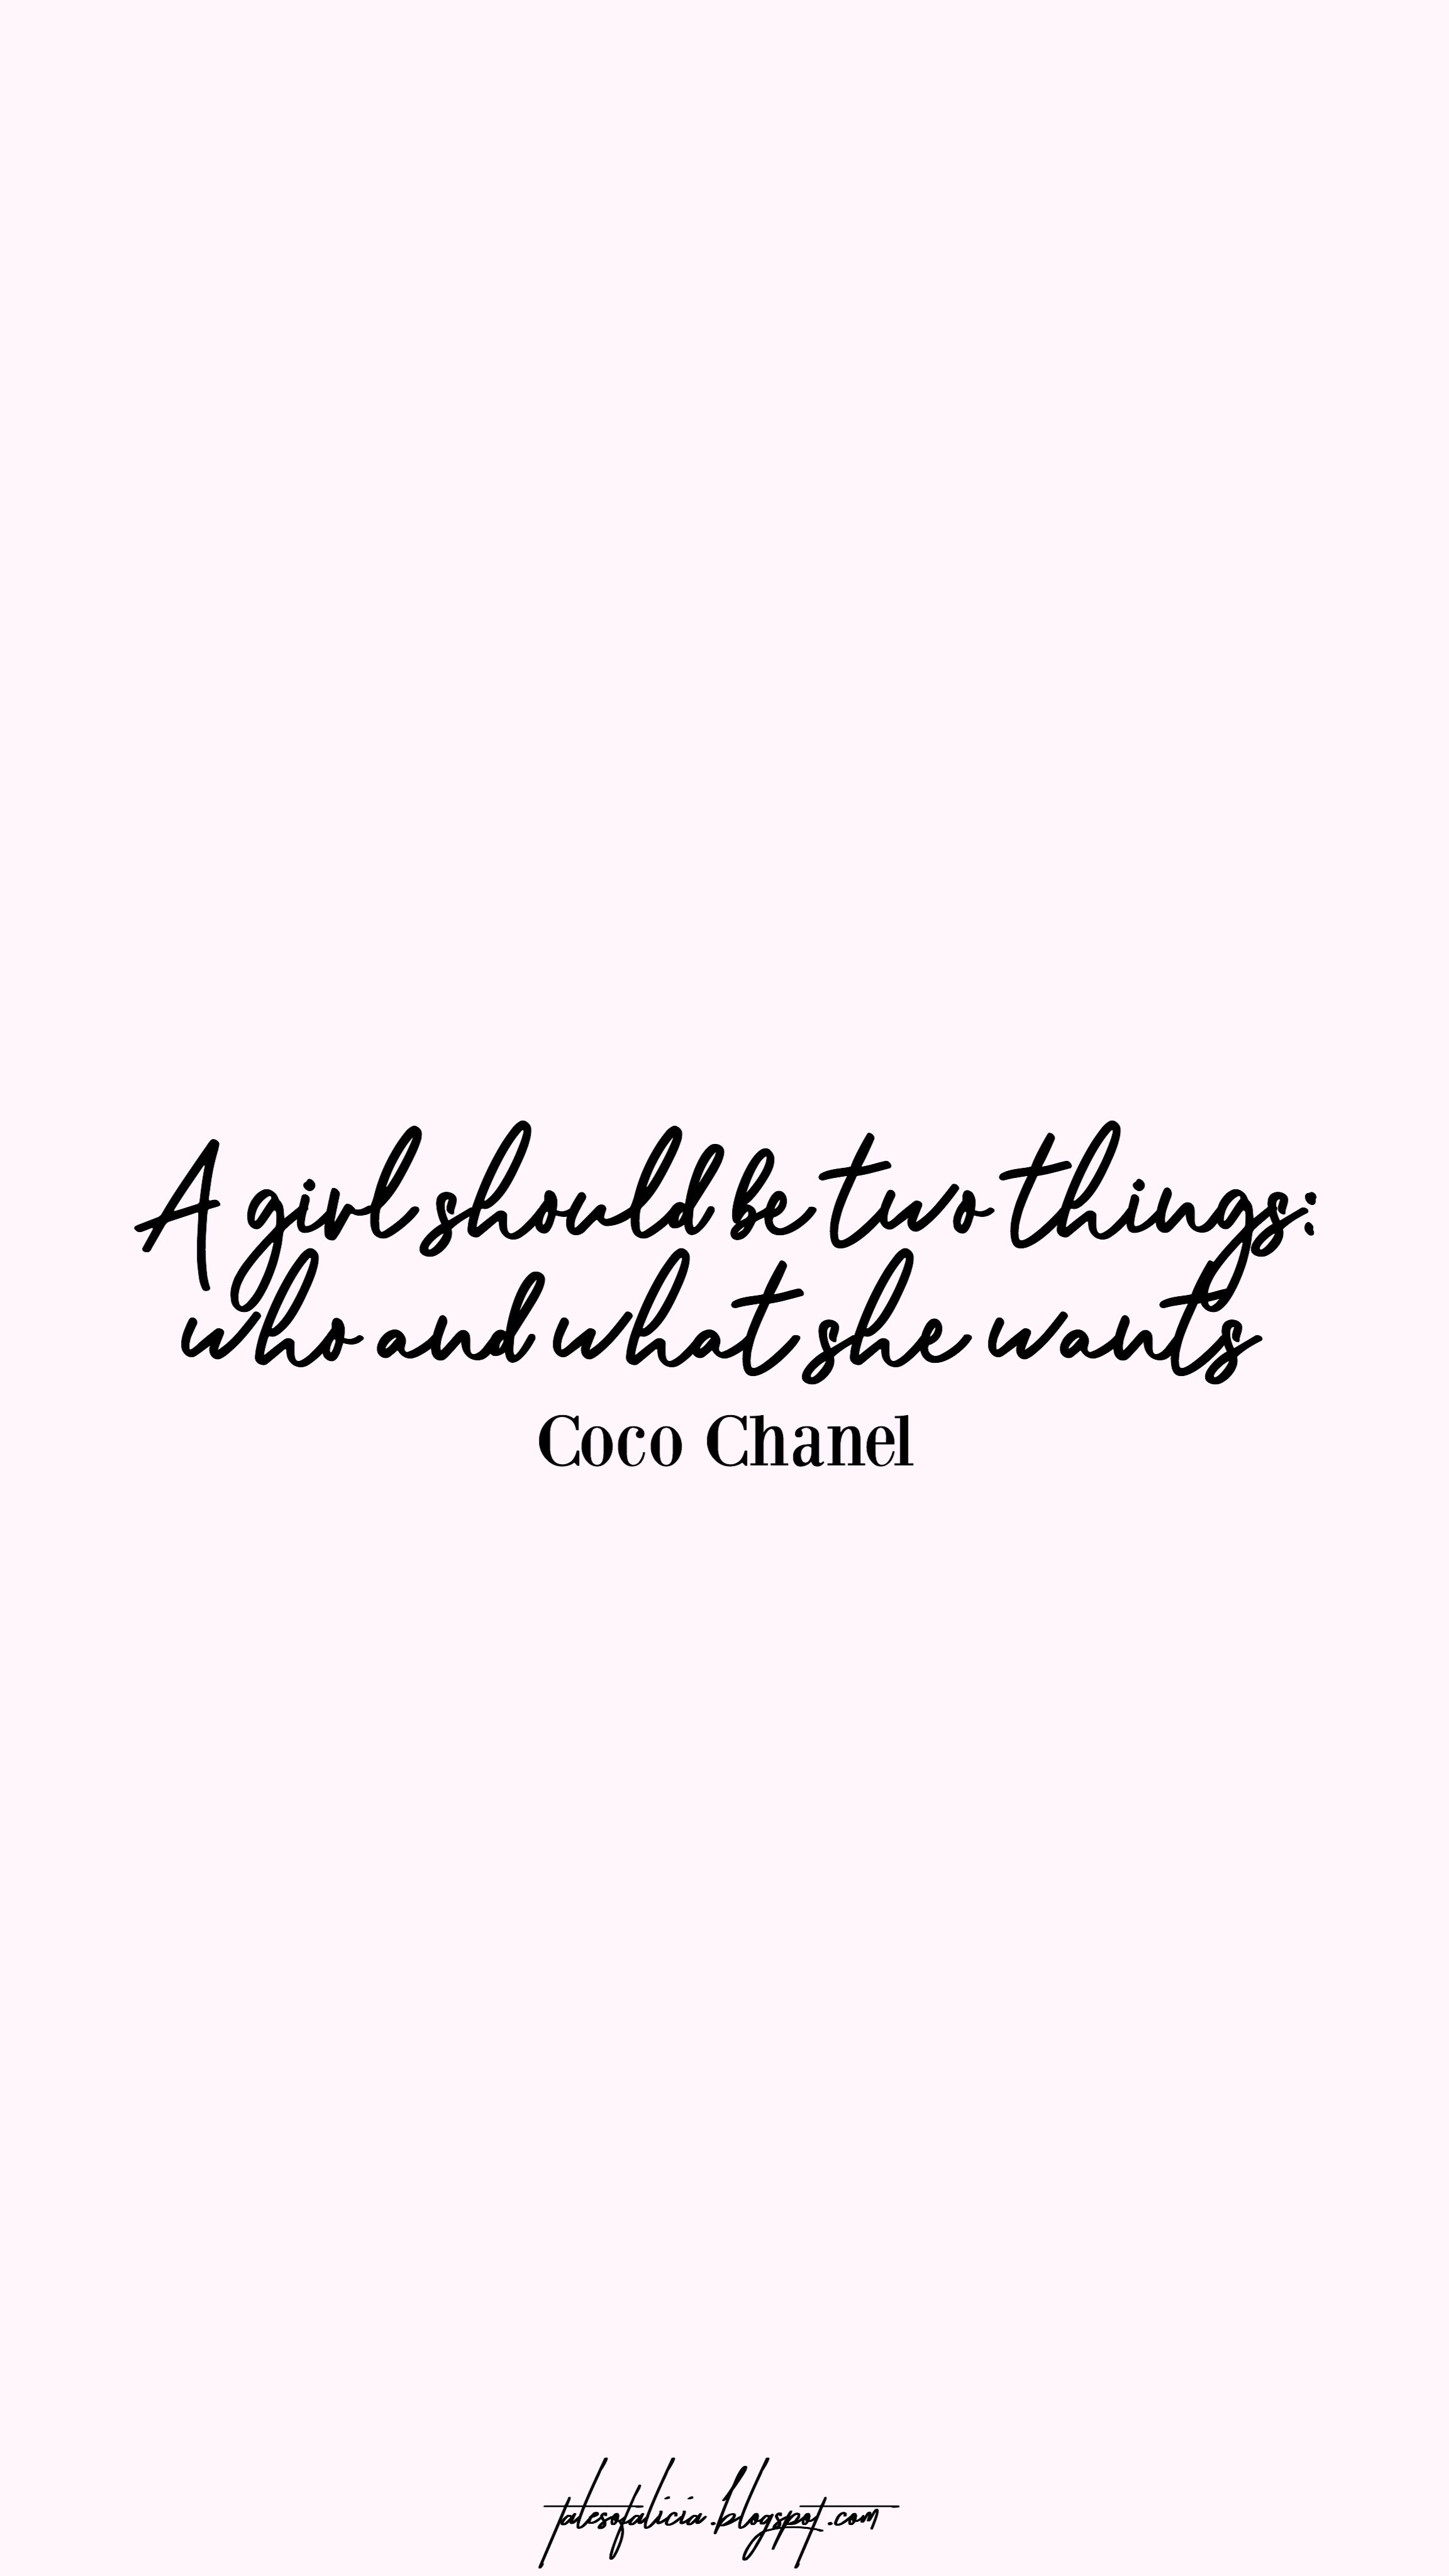 Inspirational Quotes Wallpaper Hd Free Download Zip